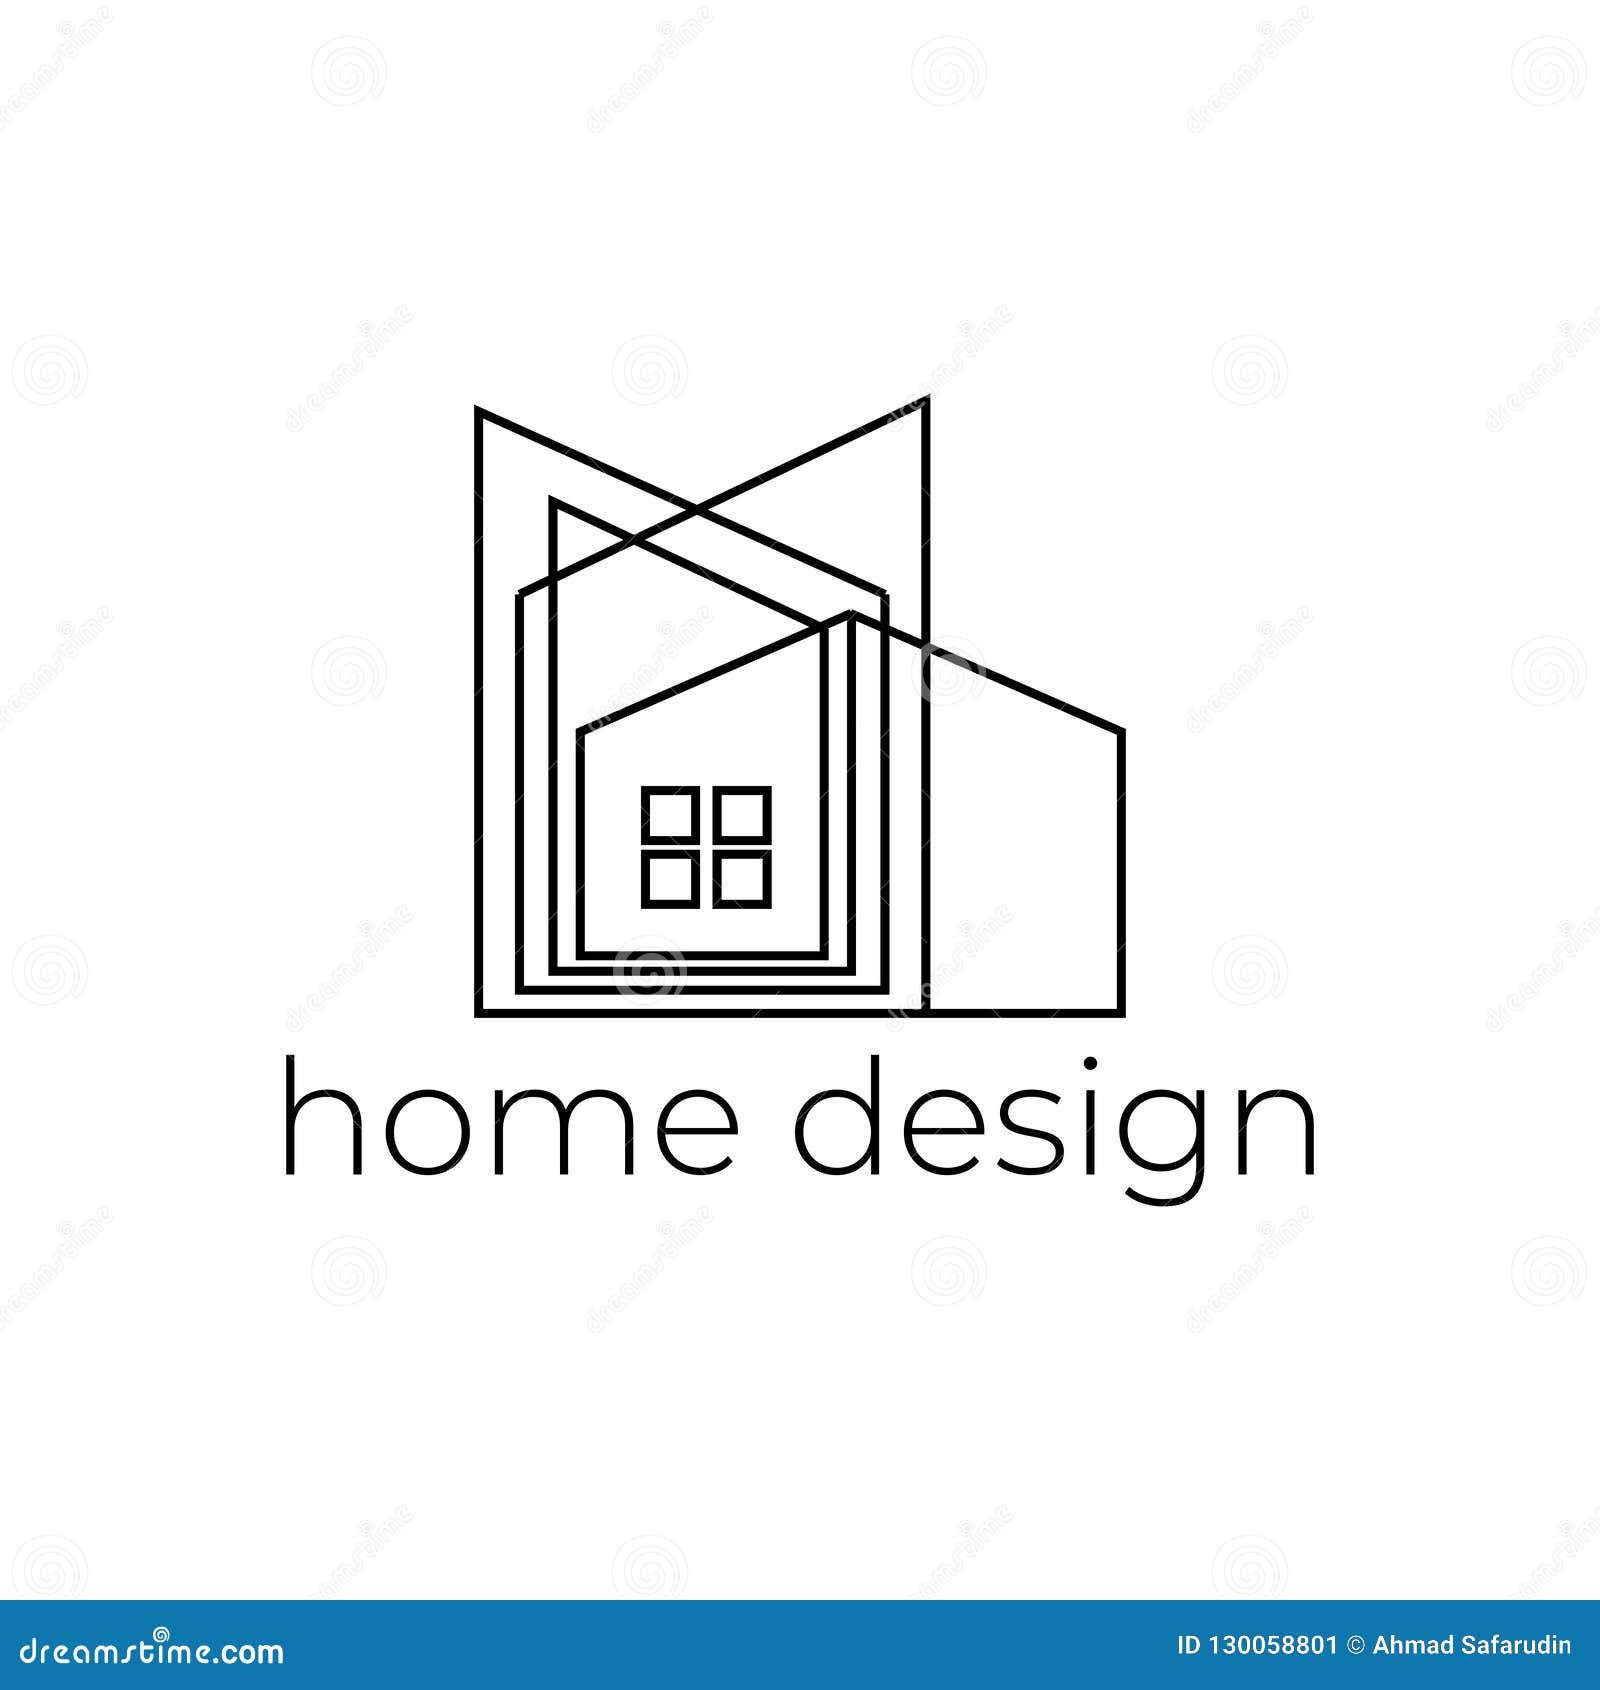 Creative Home Design Logo With Abstract Line Stock Vector ...